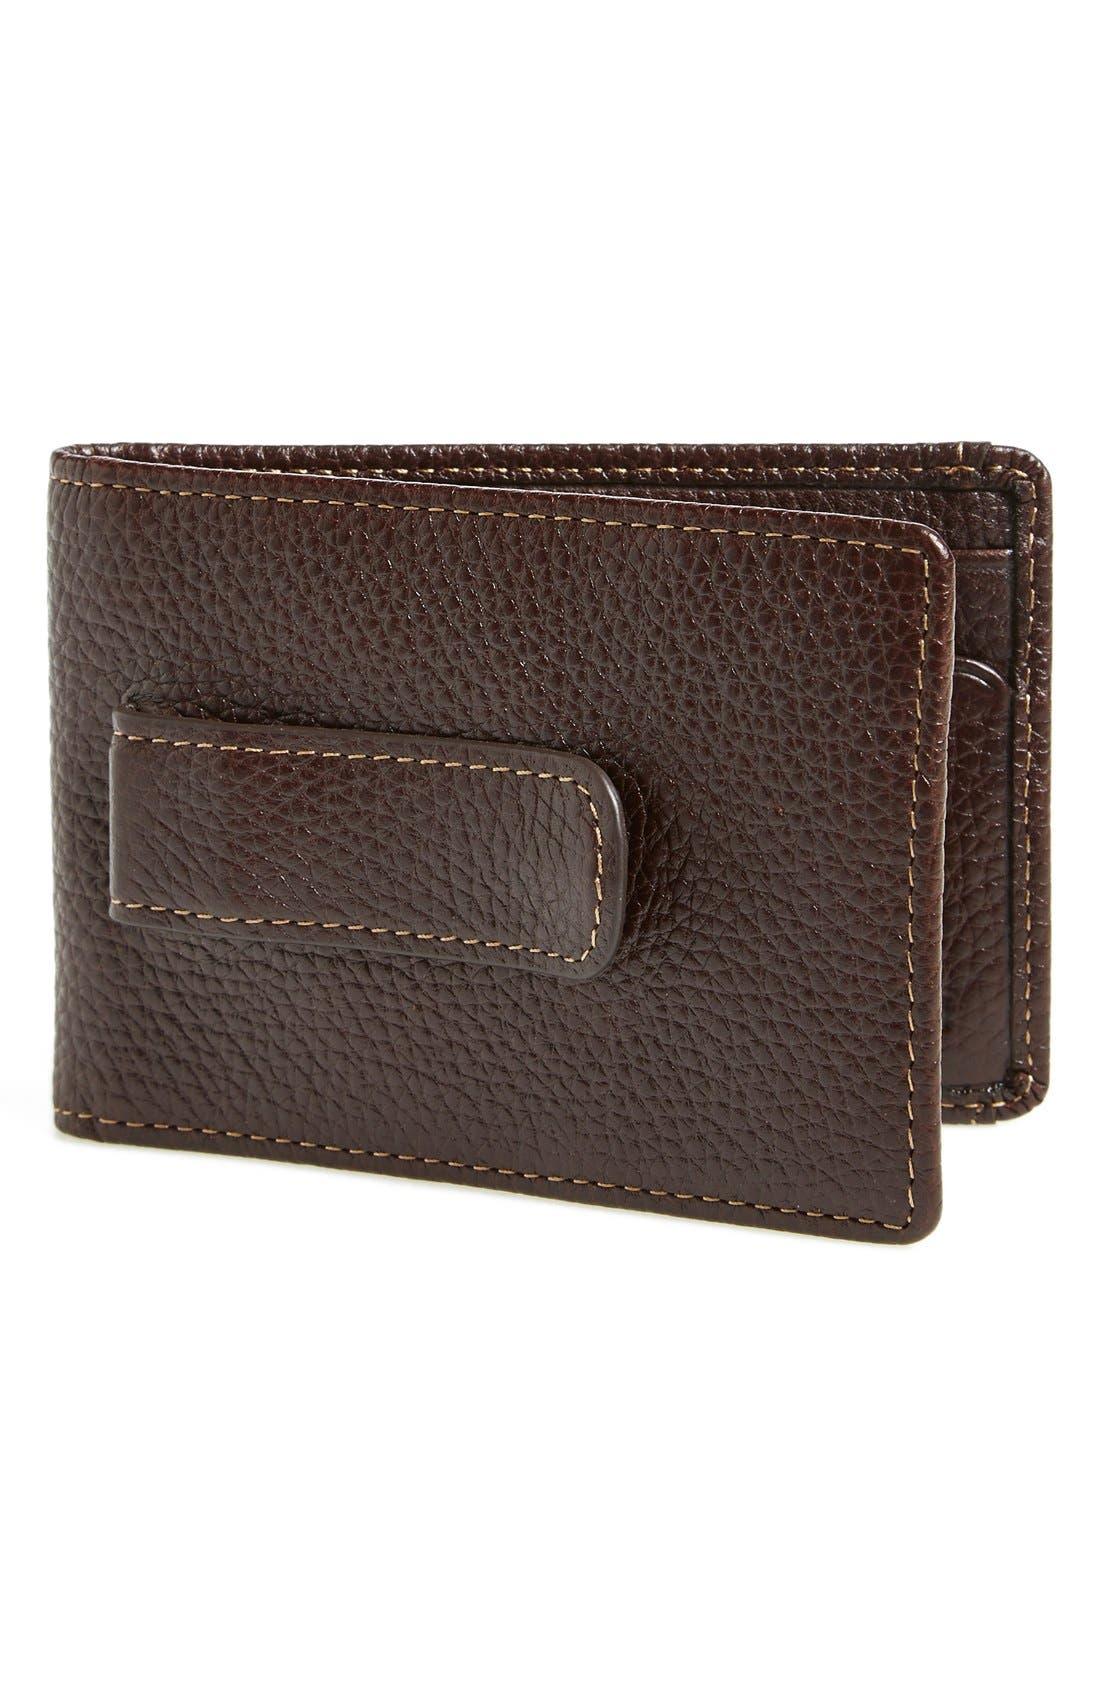 'Tyler' Money Clip Wallet,                             Main thumbnail 1, color,                             Coffee